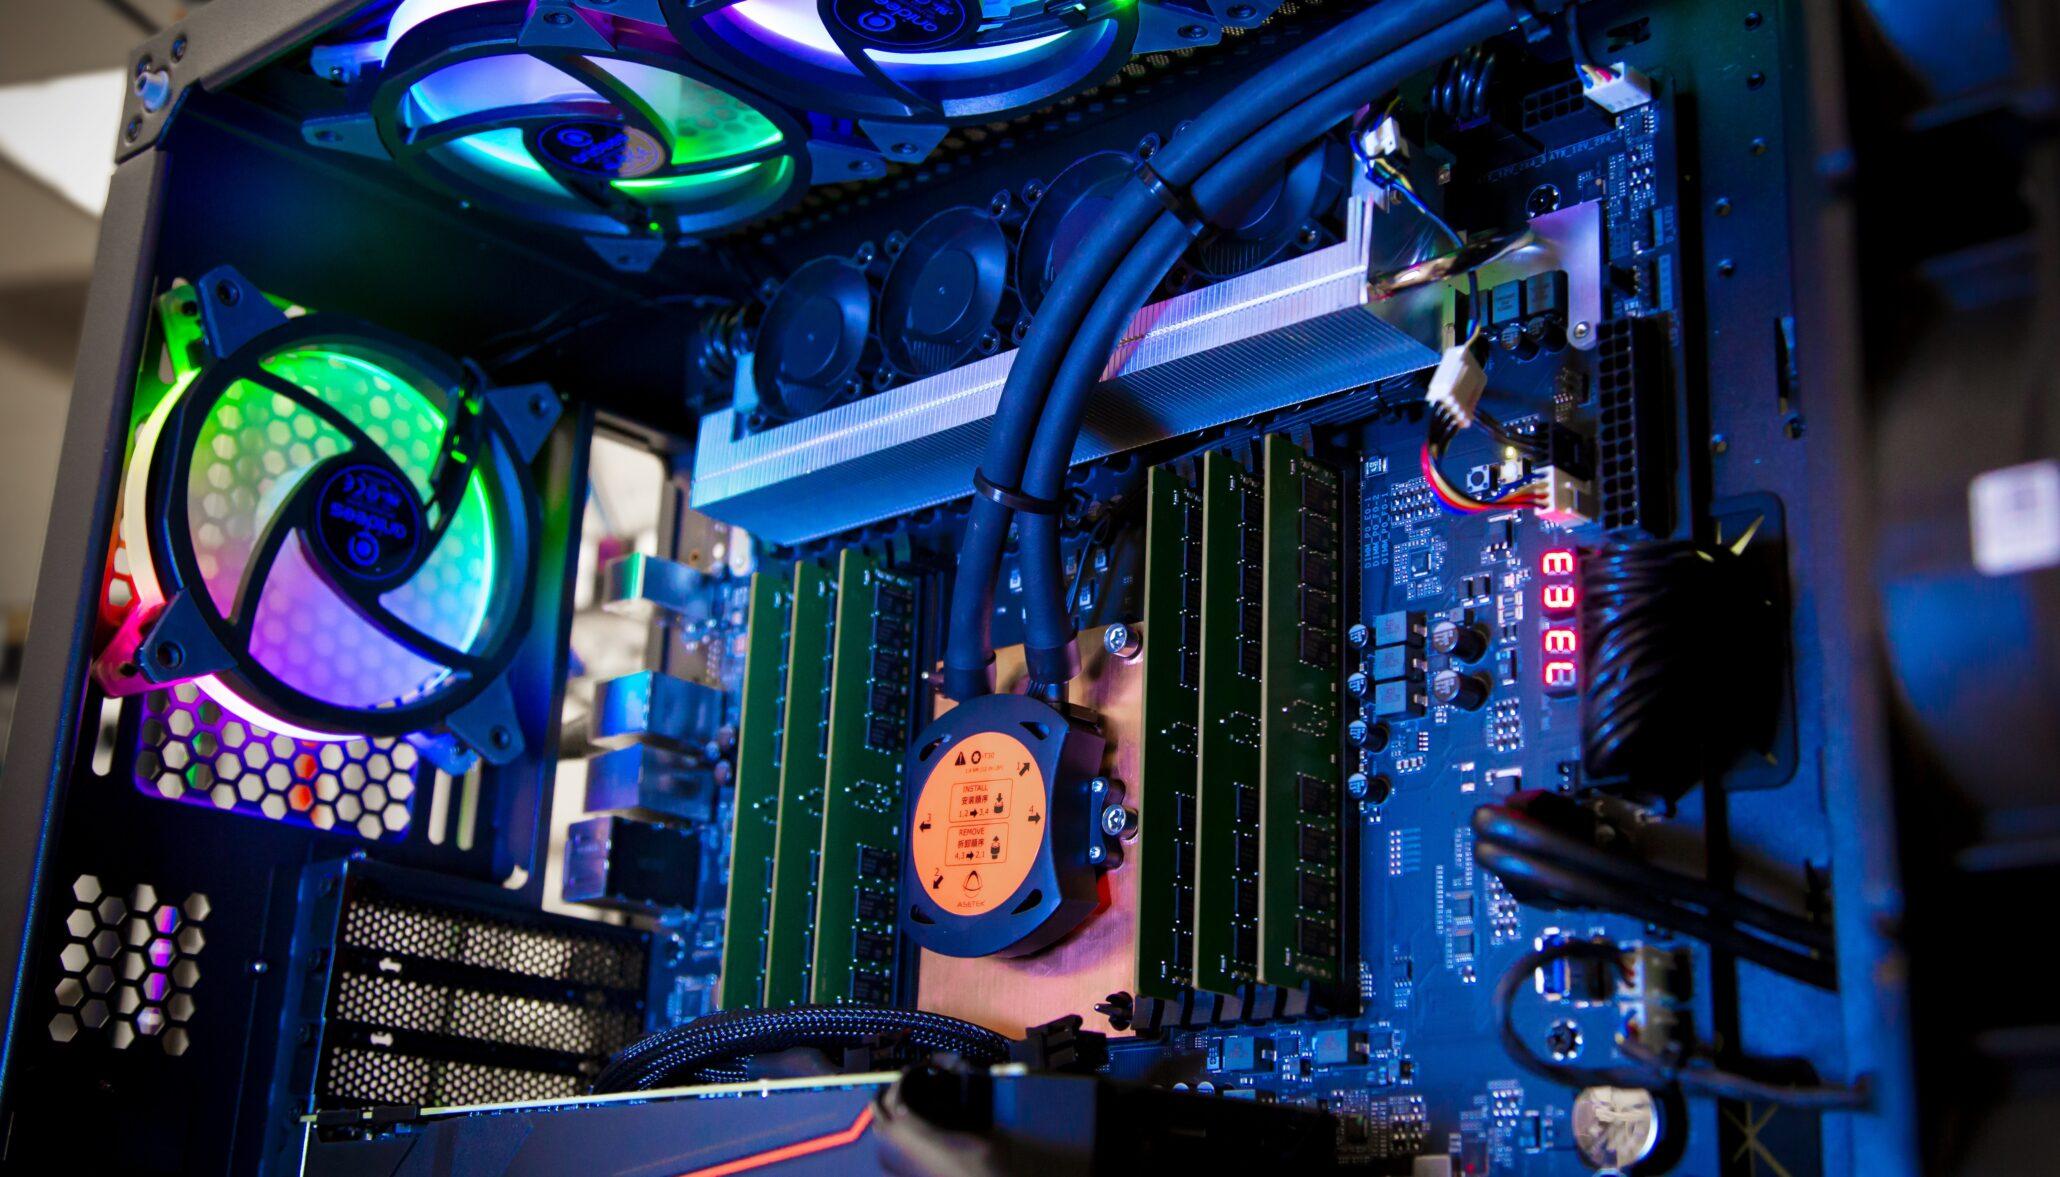 Intel Launches Ultra Premium 28 Core Xeon W 3175x Cpu For 3000